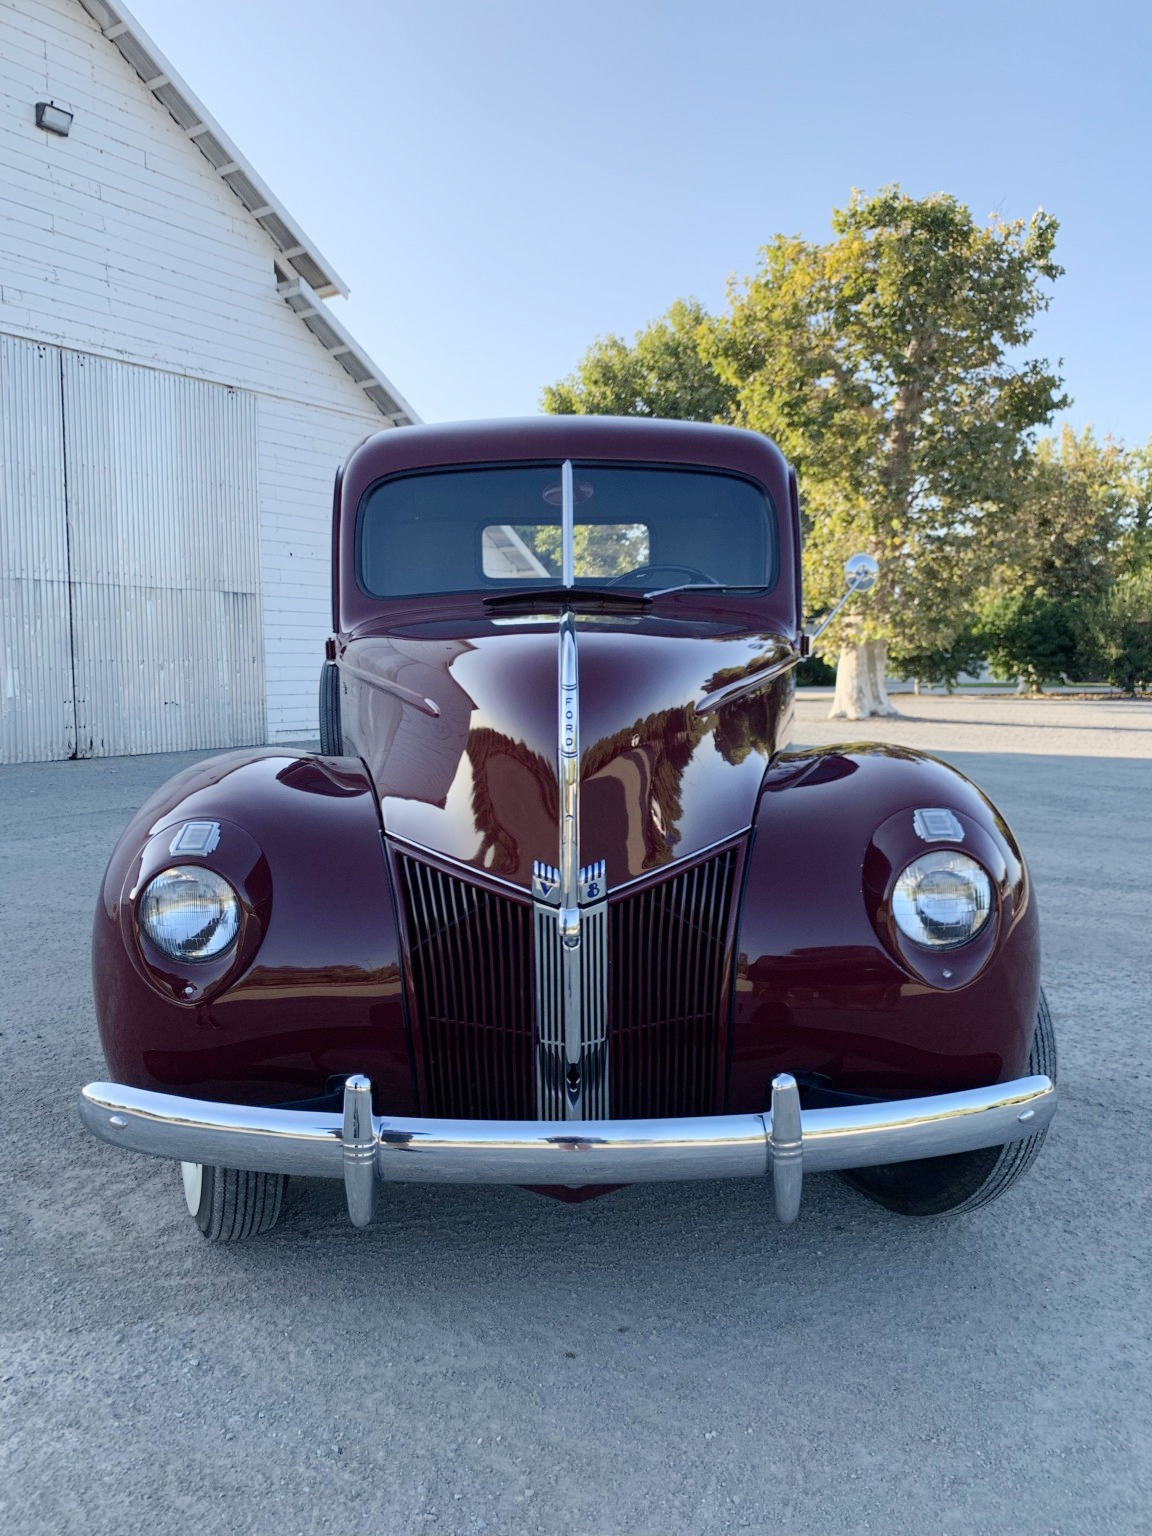 1940 Ford Pickup 221ci Flathead V8 4x4 2.jpg